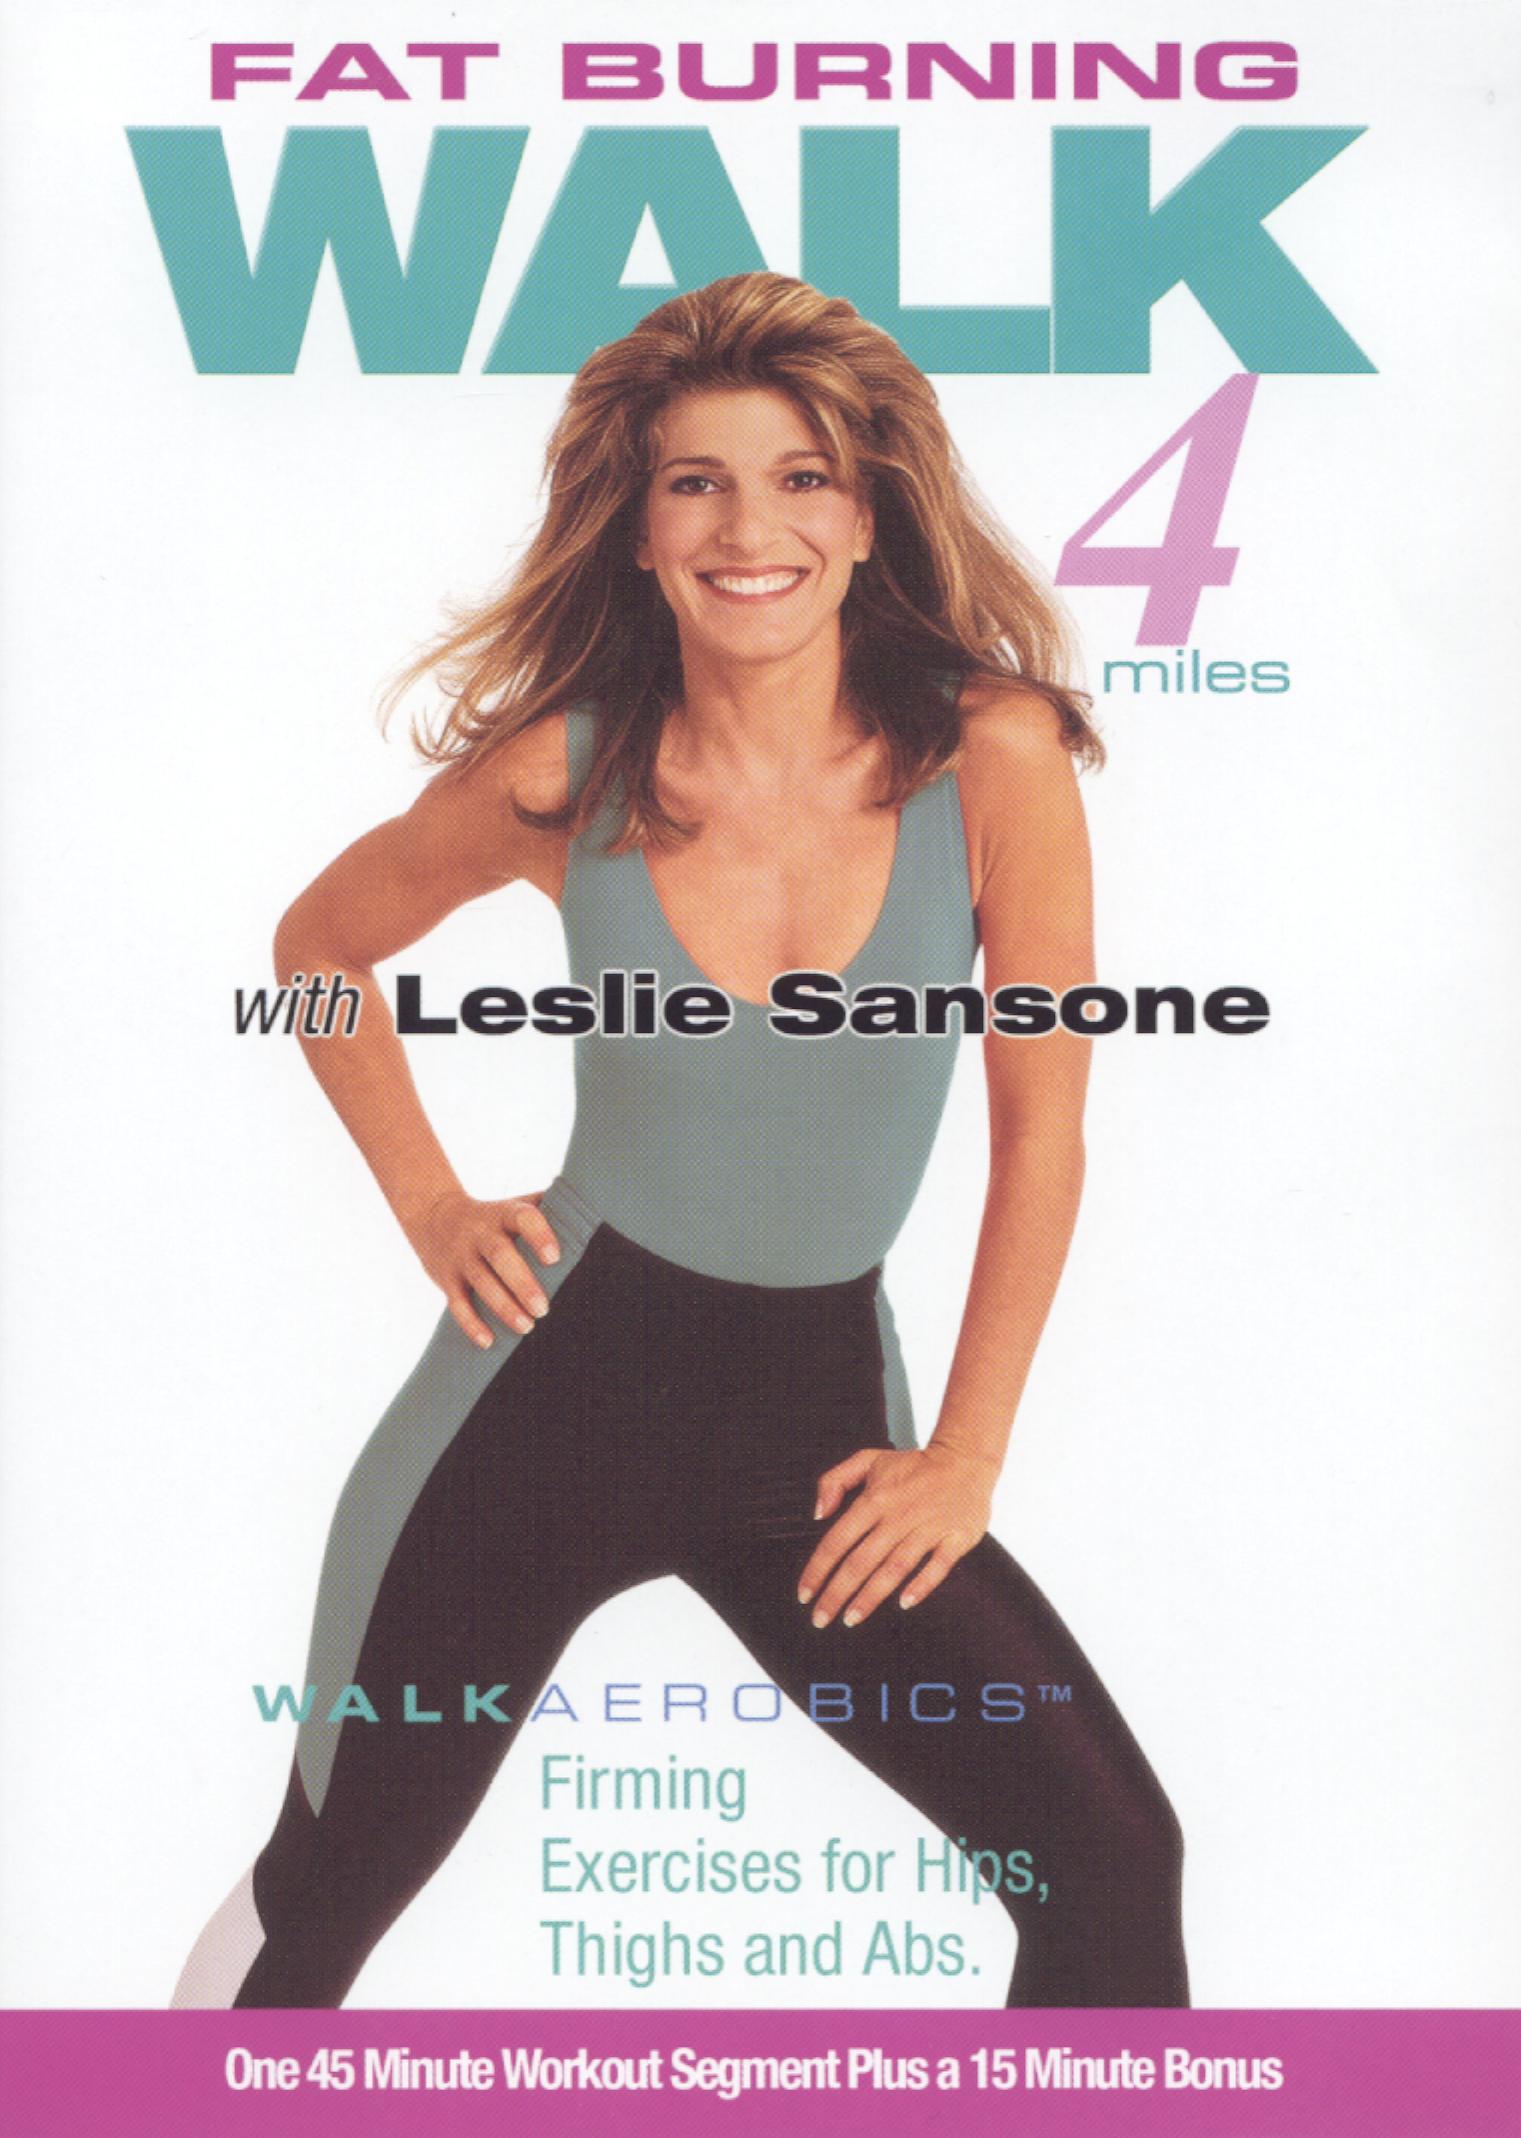 Leslie Sansone: Fat Burning Walk - 4 Miles